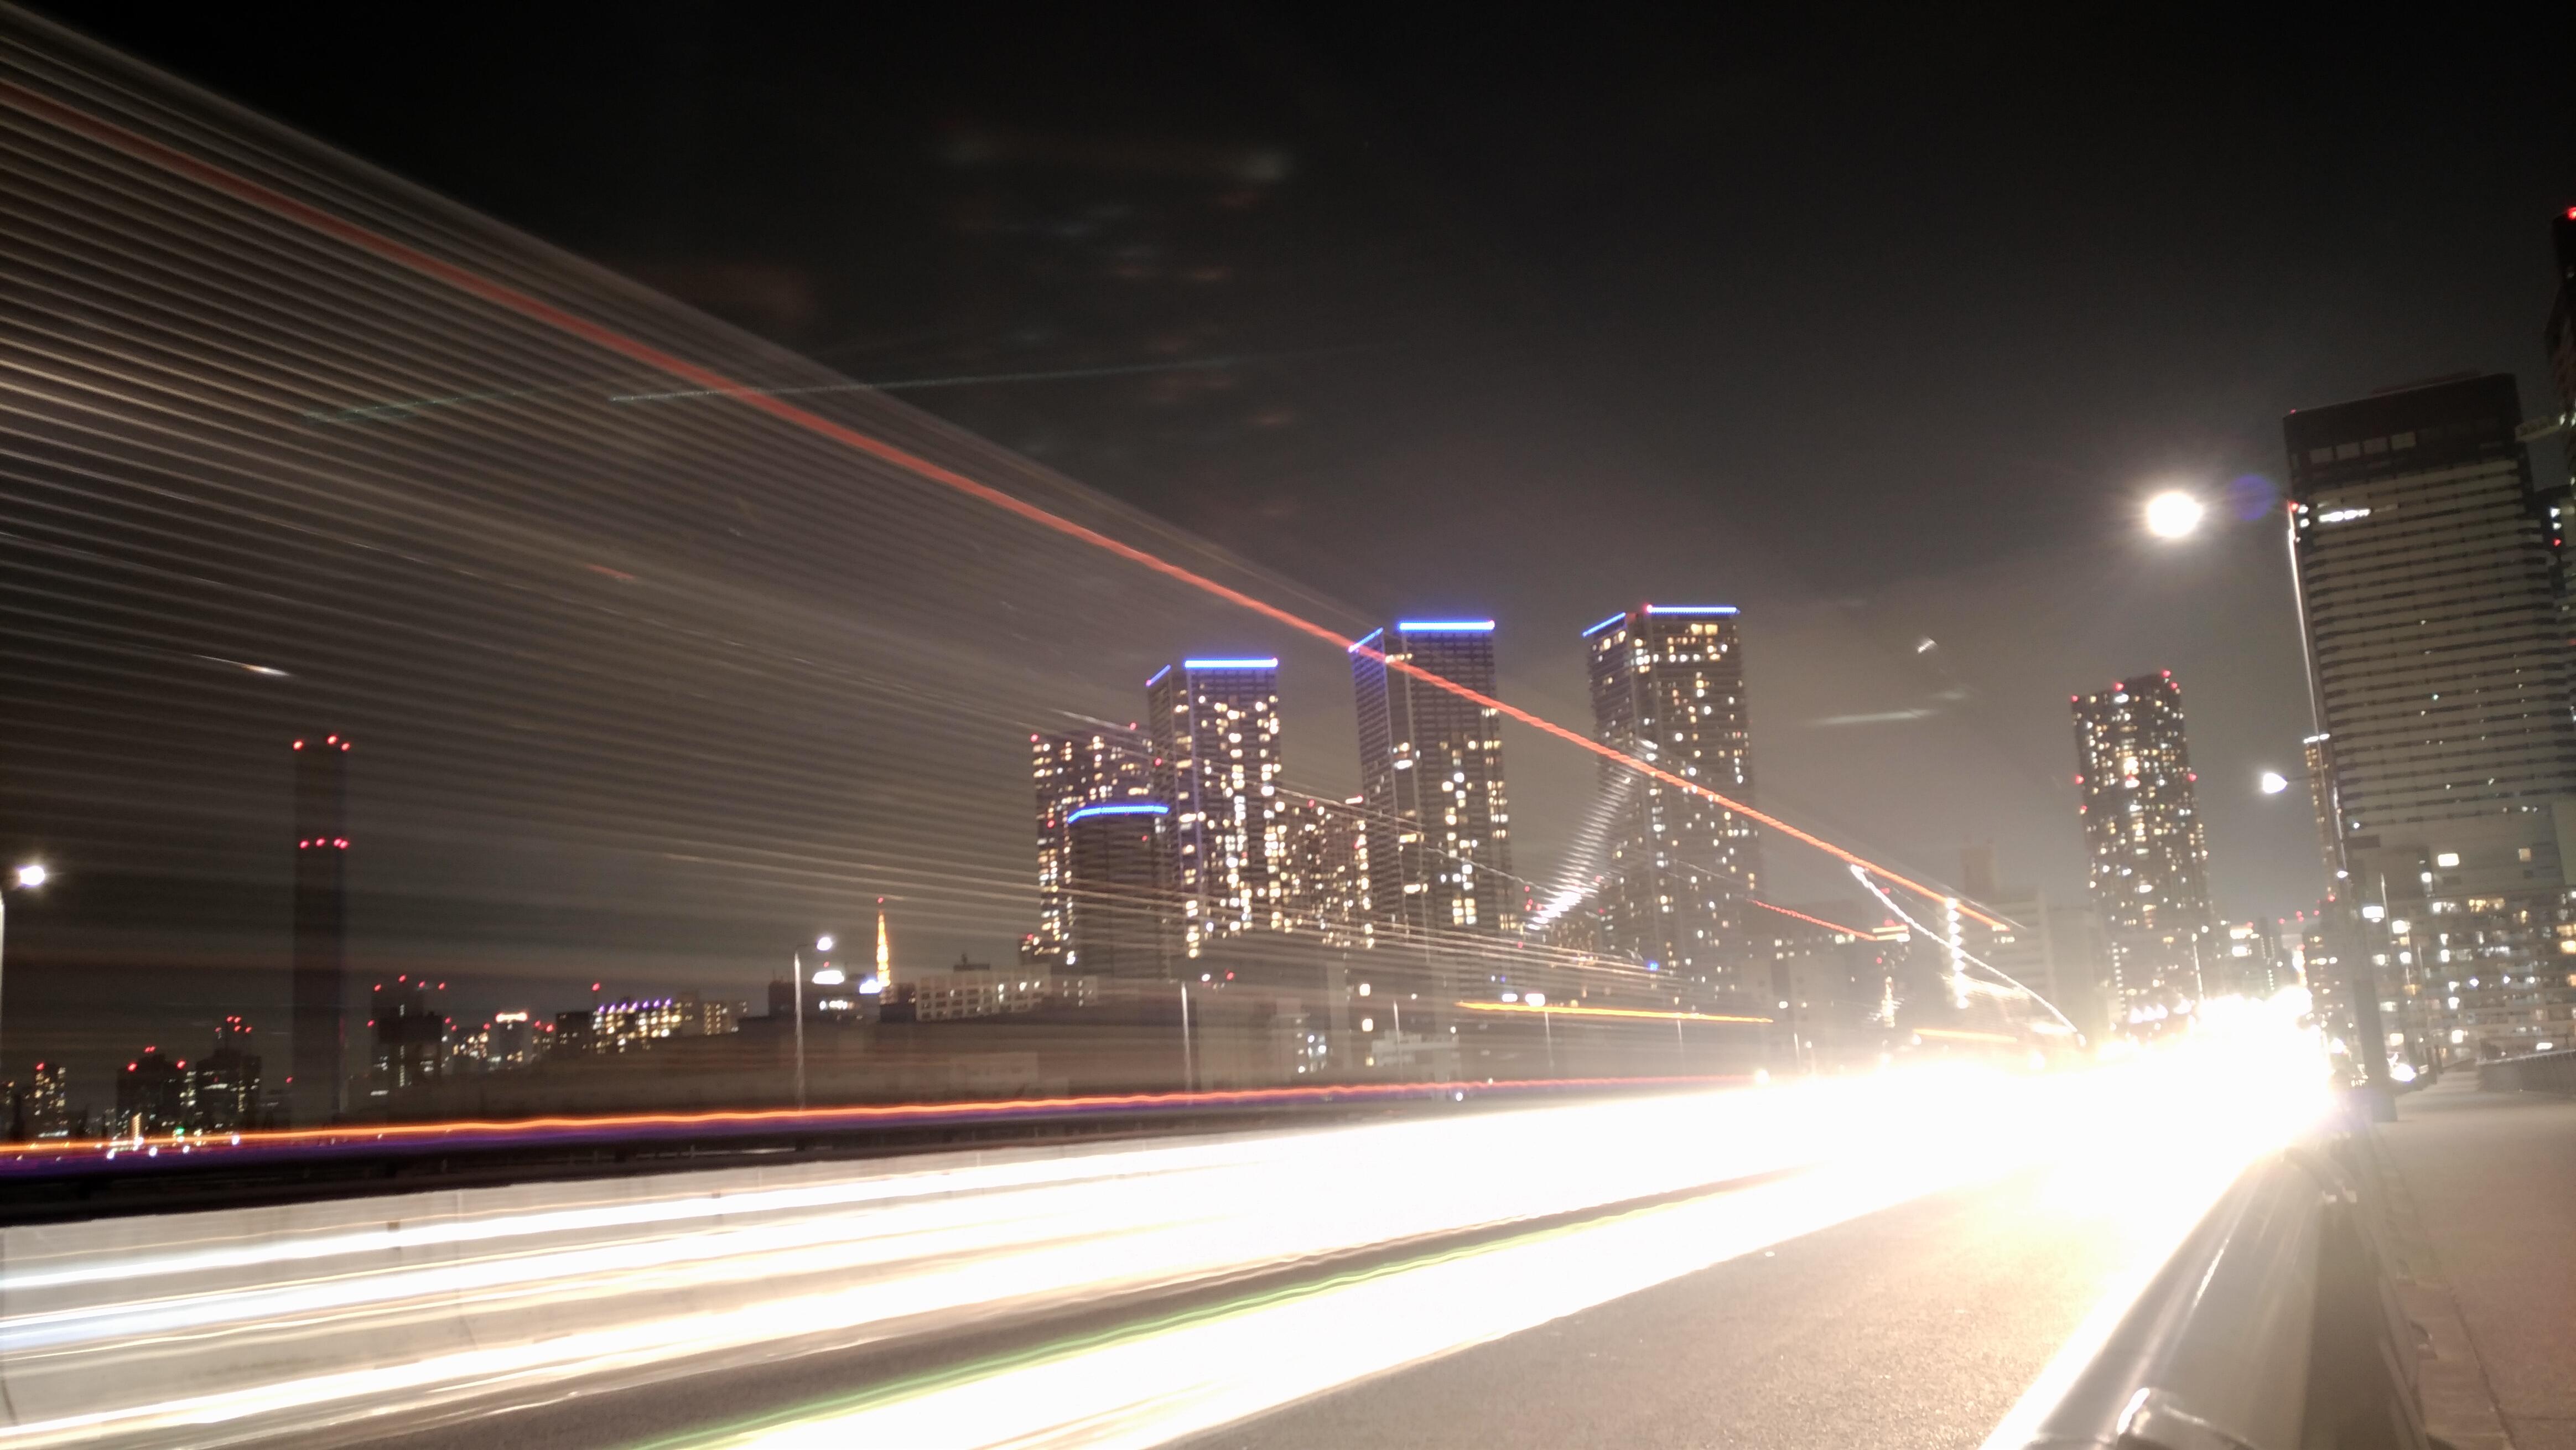 ZenFone 3で綺麗に夜景を撮るための方法と作例